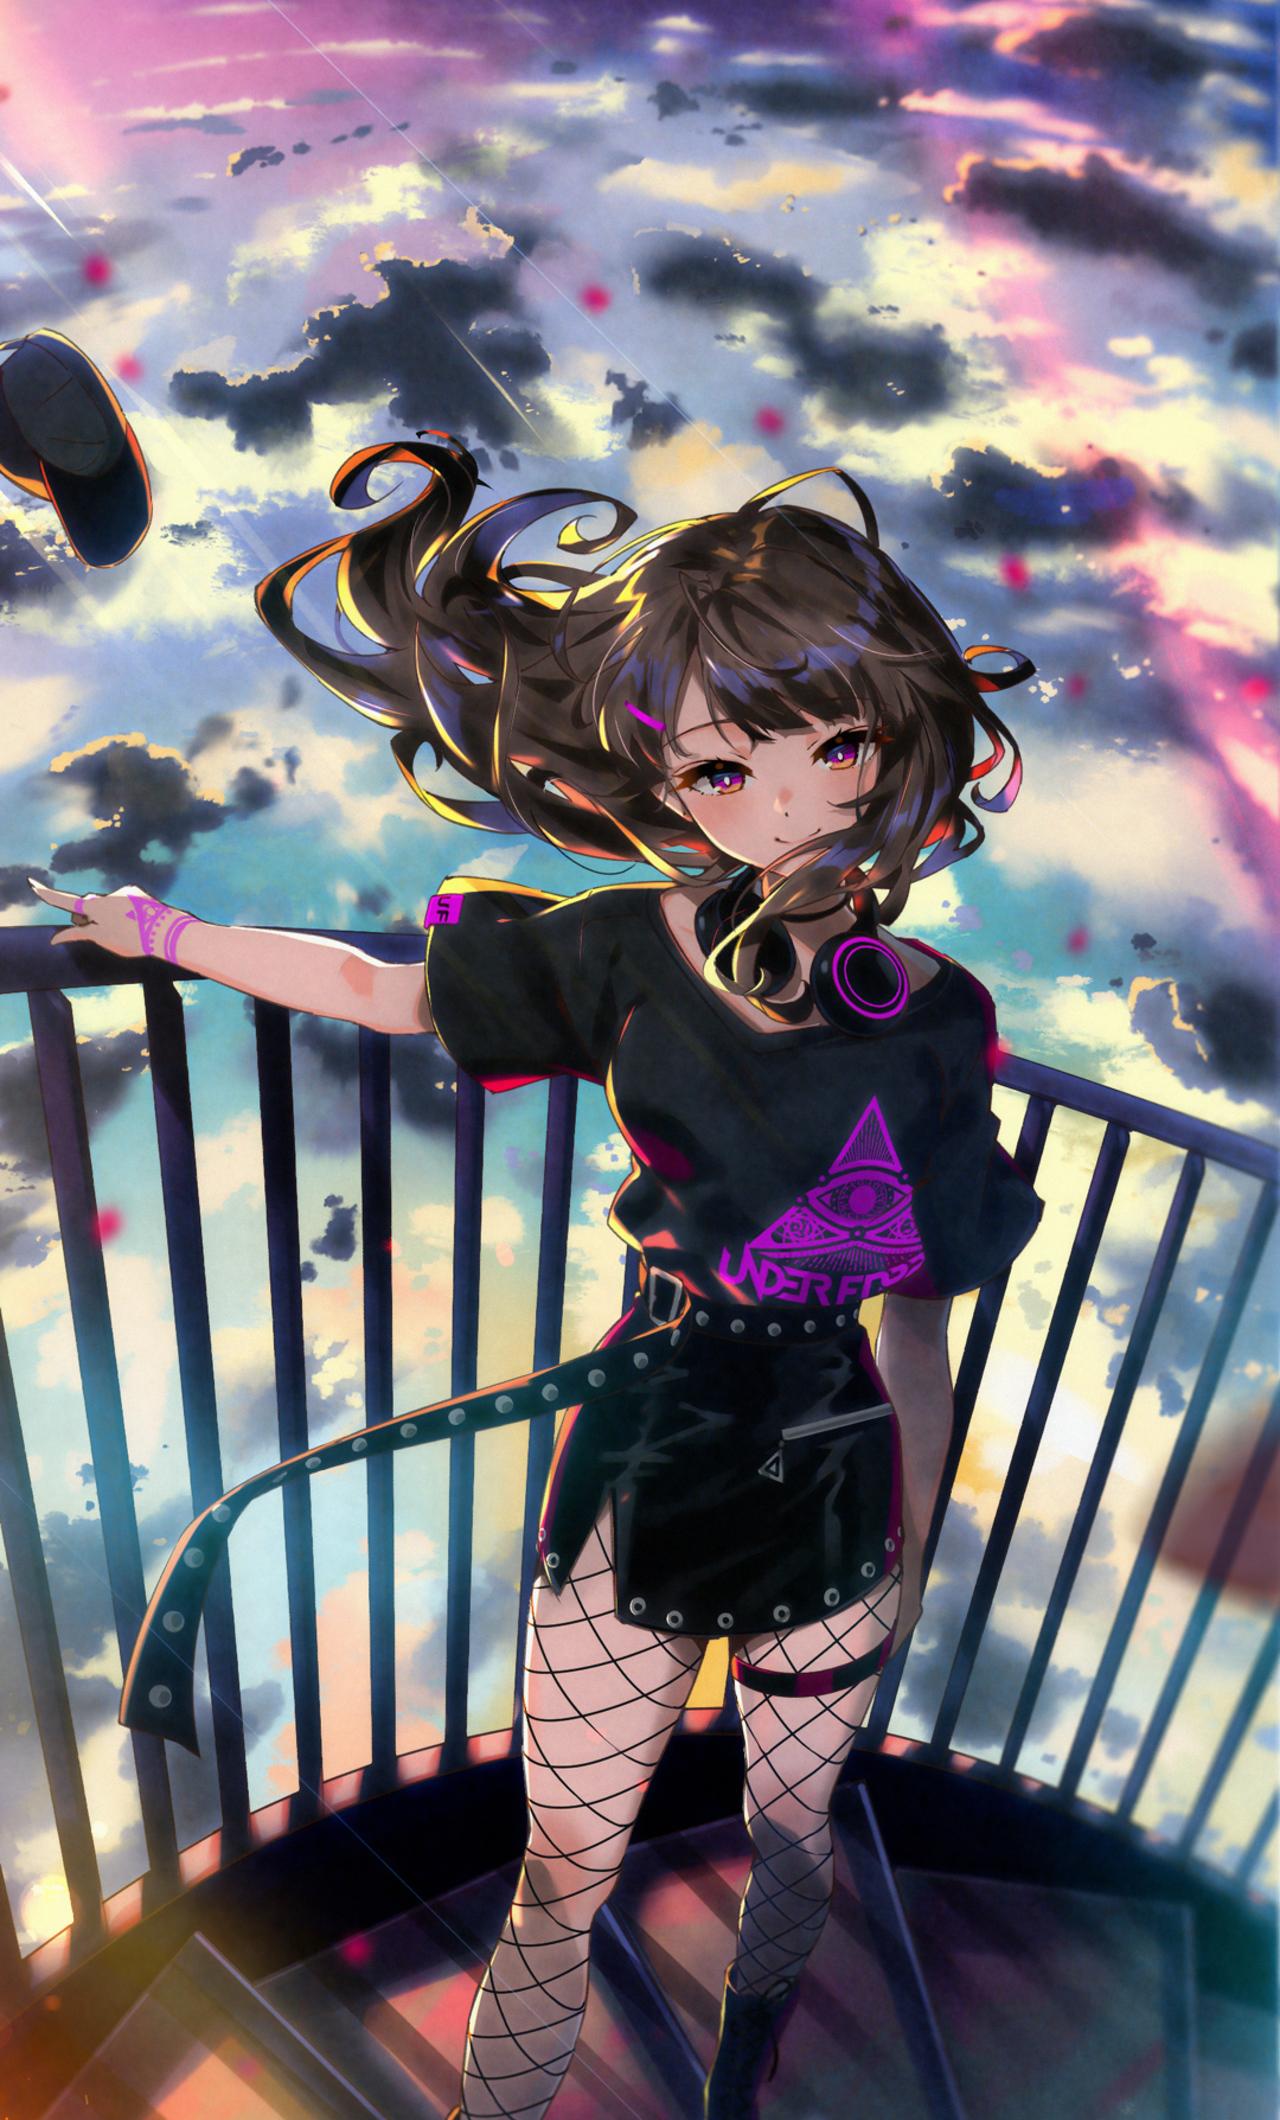 Iphone 11 Wallpaper Anime Girl Blue 4k Hd Download Anime Girl Wallpaper Portrait 1280x2120 Download Hd Wallpaper Wallpapertip